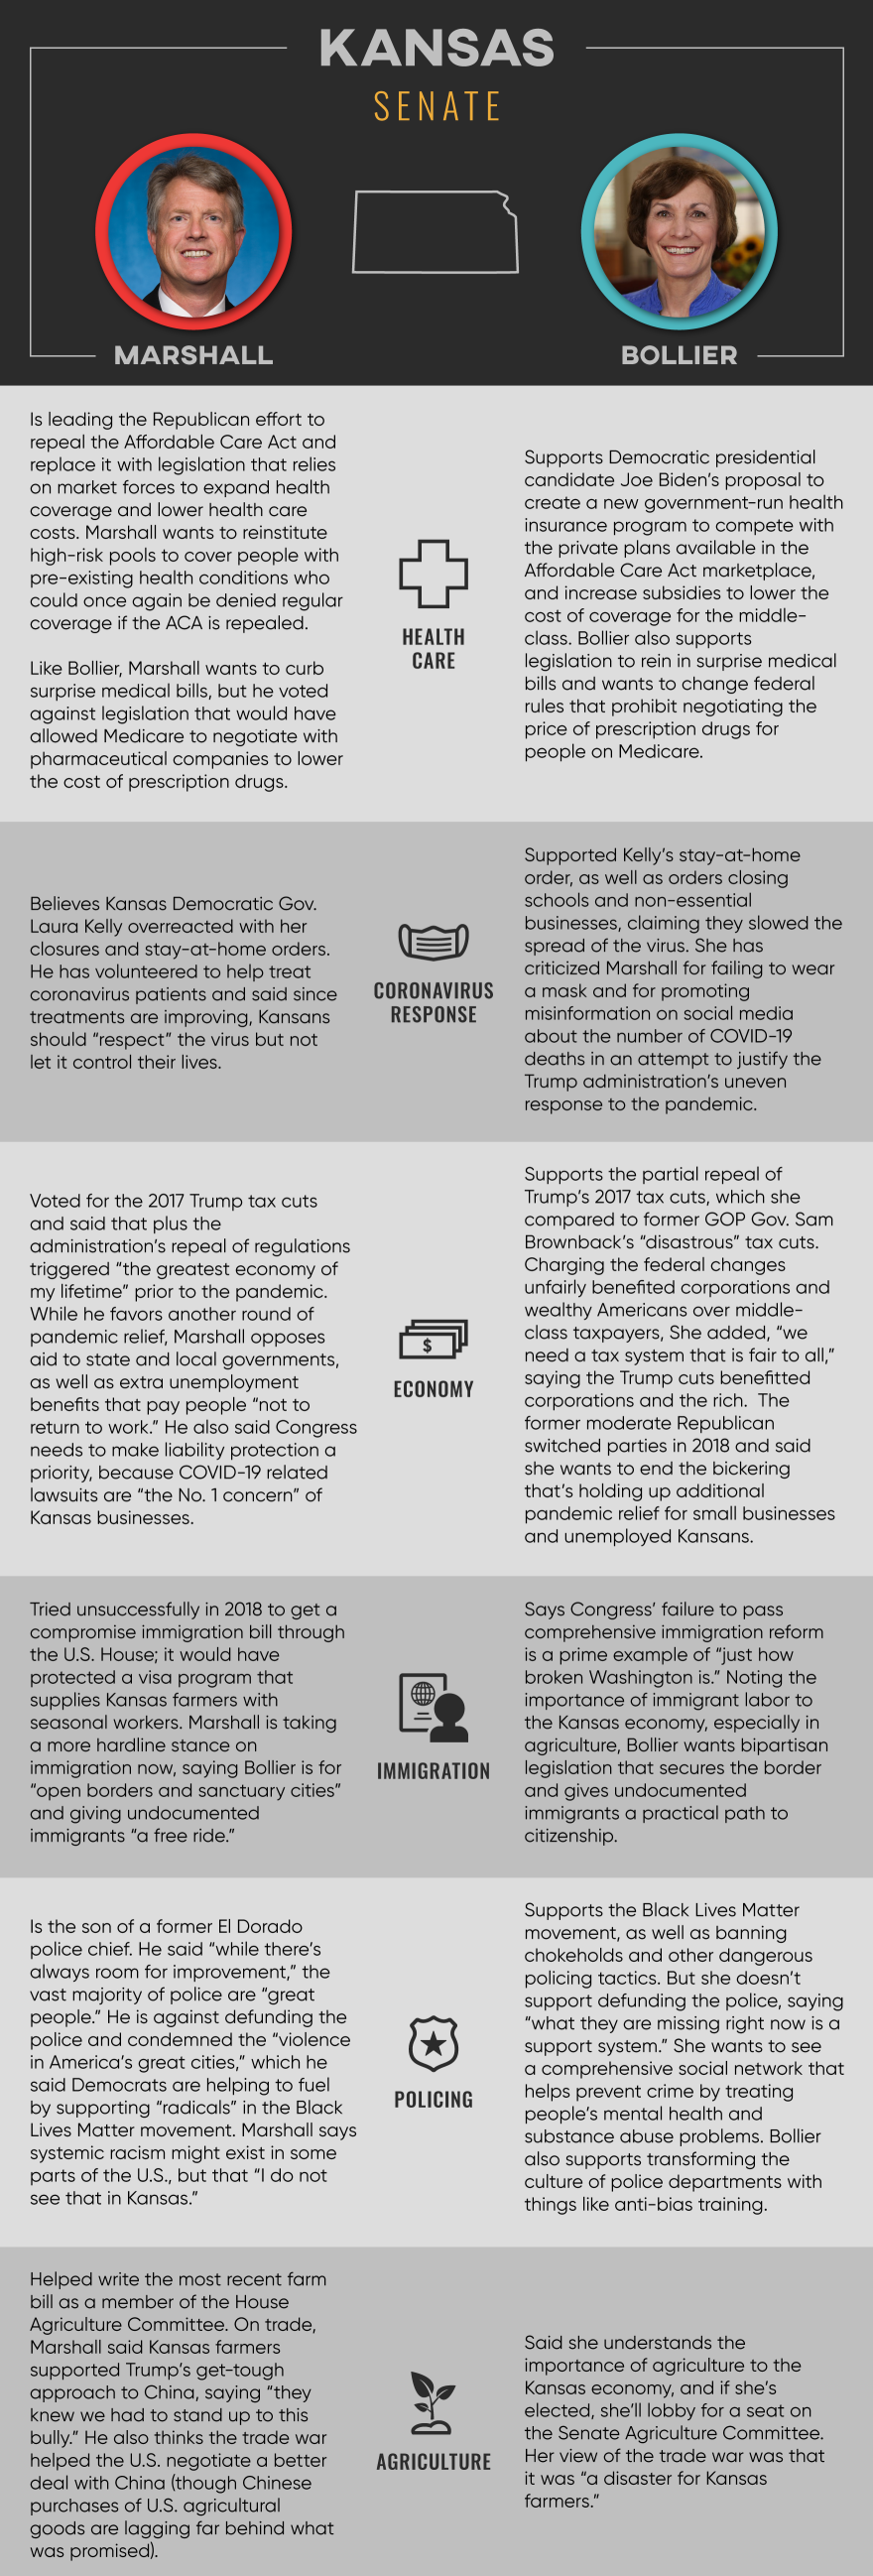 GROVE_ks_senate_candidate_comparison.png